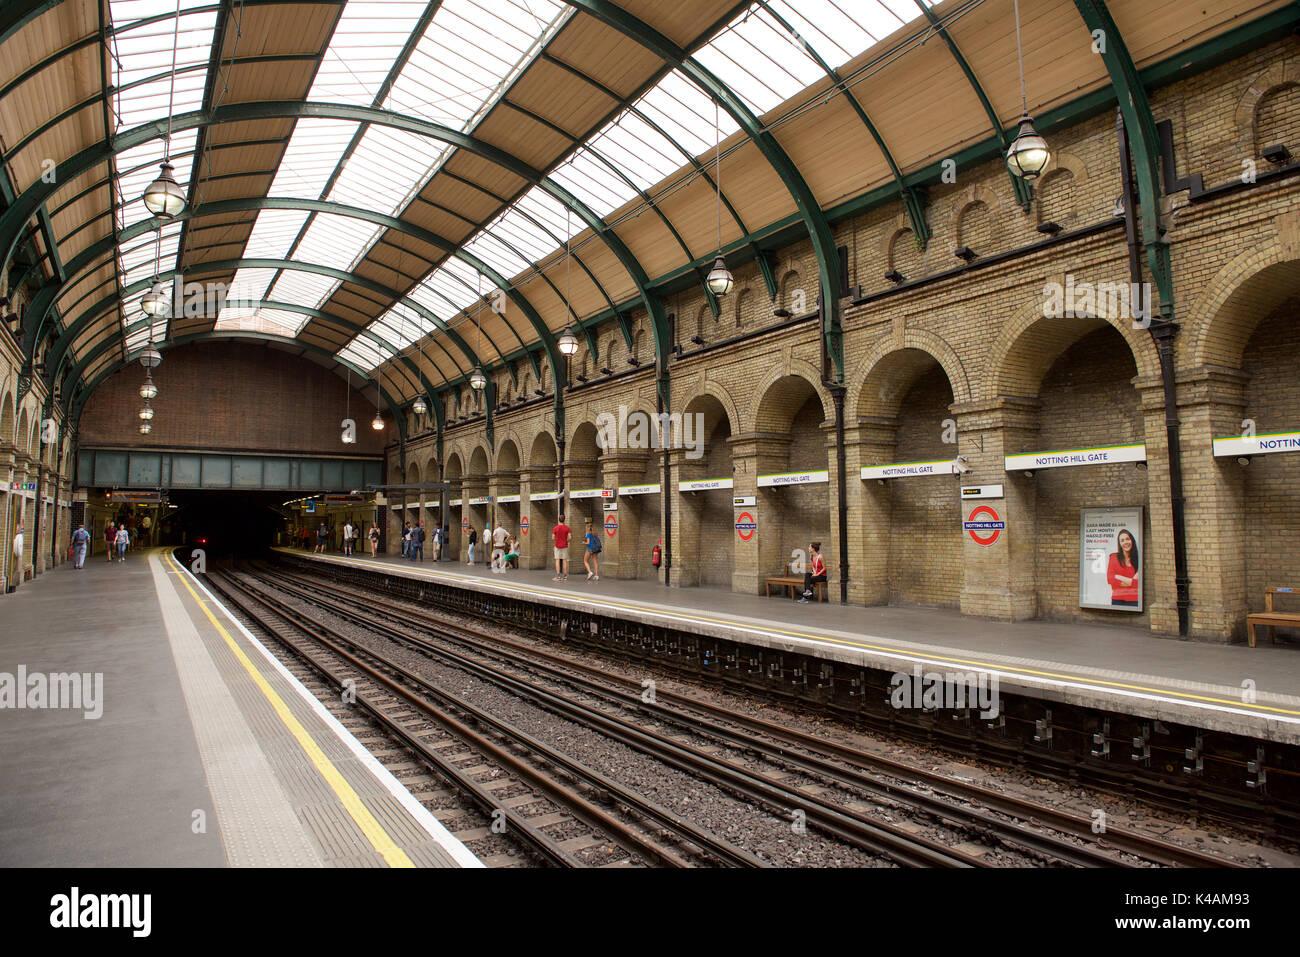 Notting Hill Gate Railway Station Photo Bayswater- Kensington 1 Metropolitan